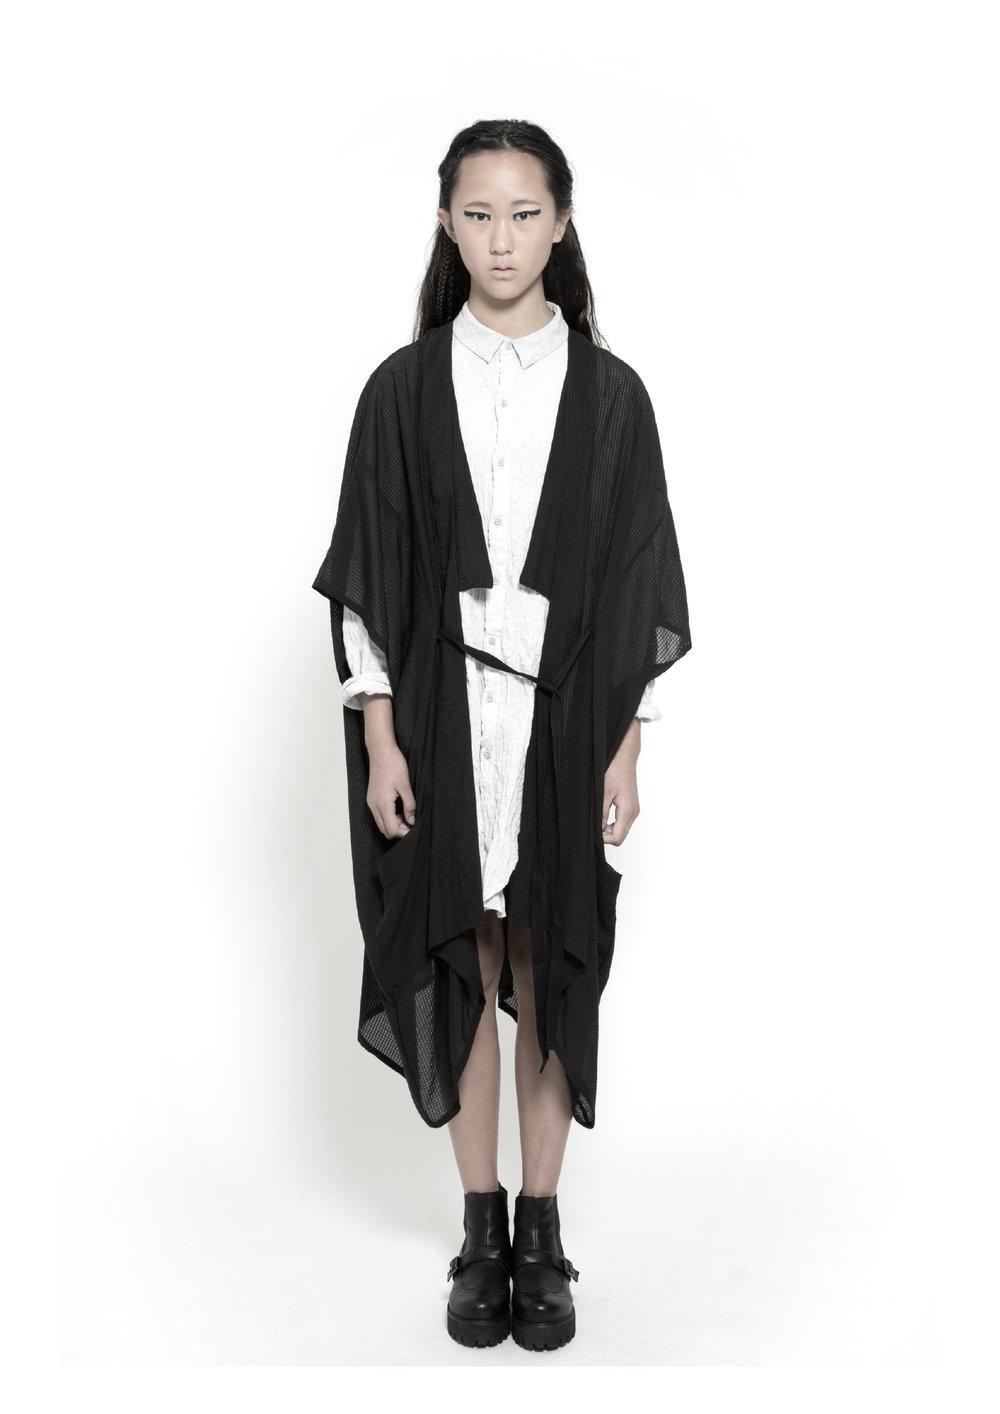 Napoon Robe 1.jpg